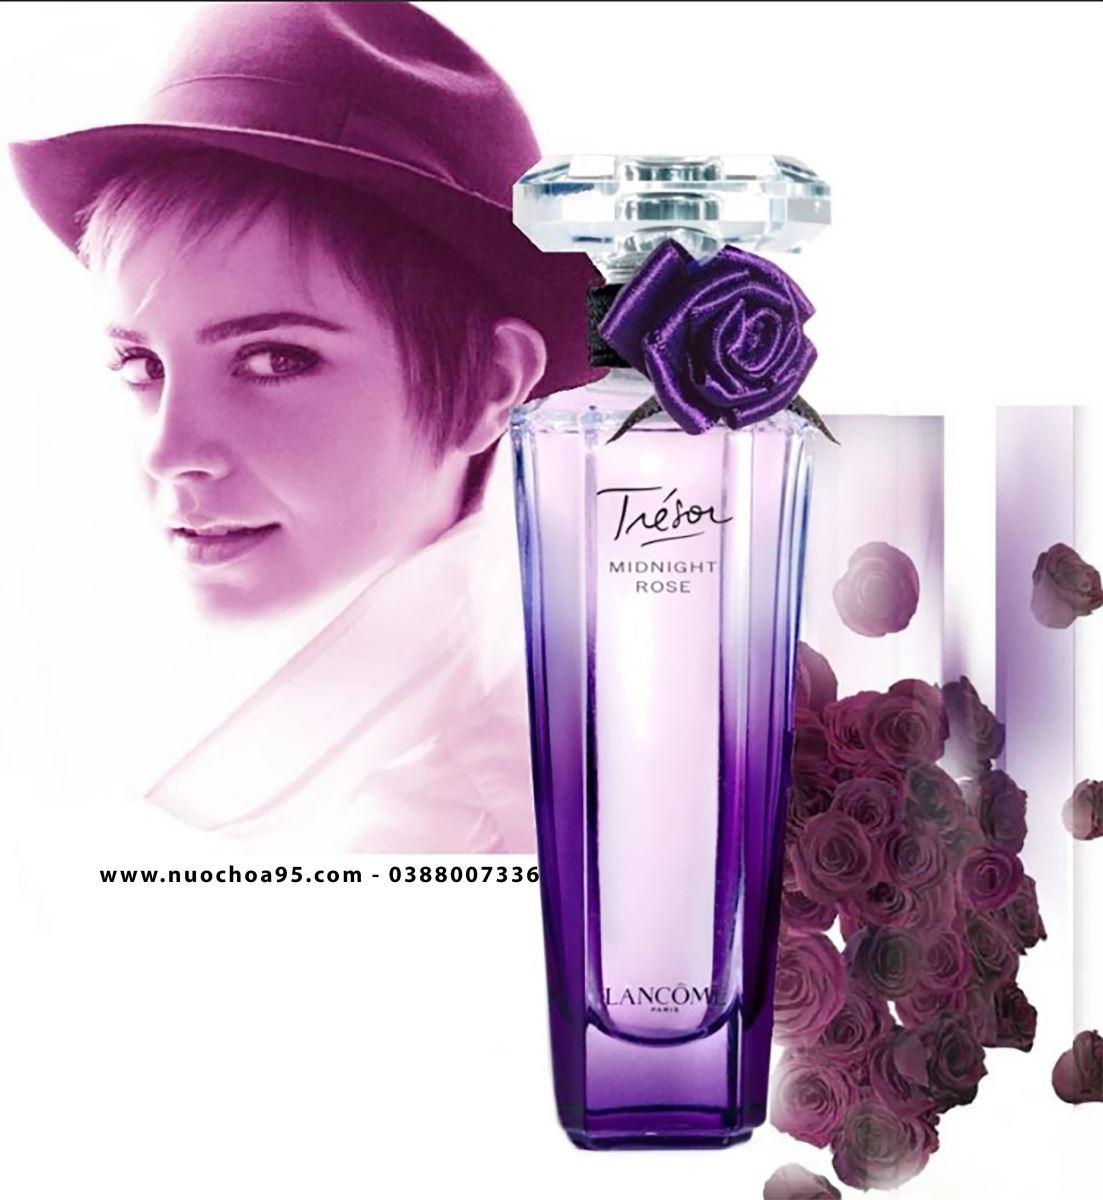 Nước hoa Tresor Midnight Rose - Ảnh 2